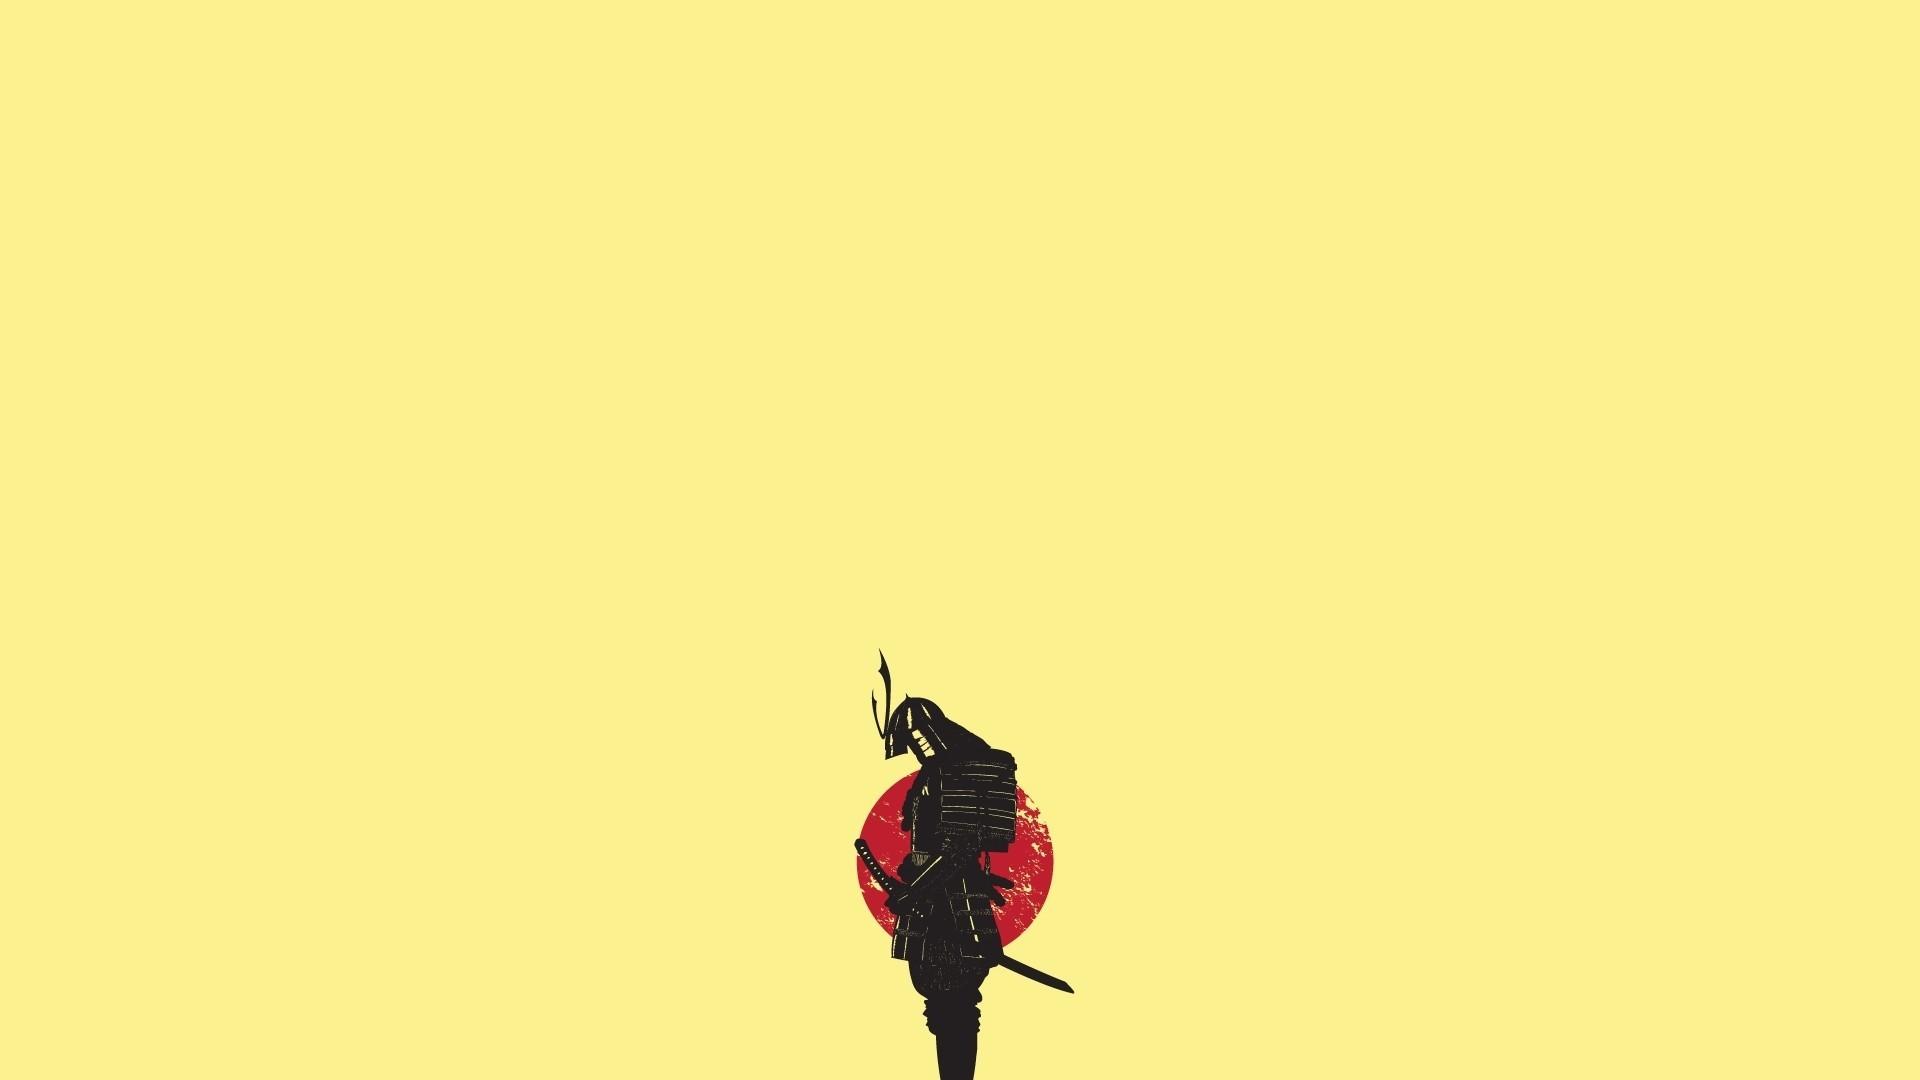 Red Samurai Wallpaper 1920X1080